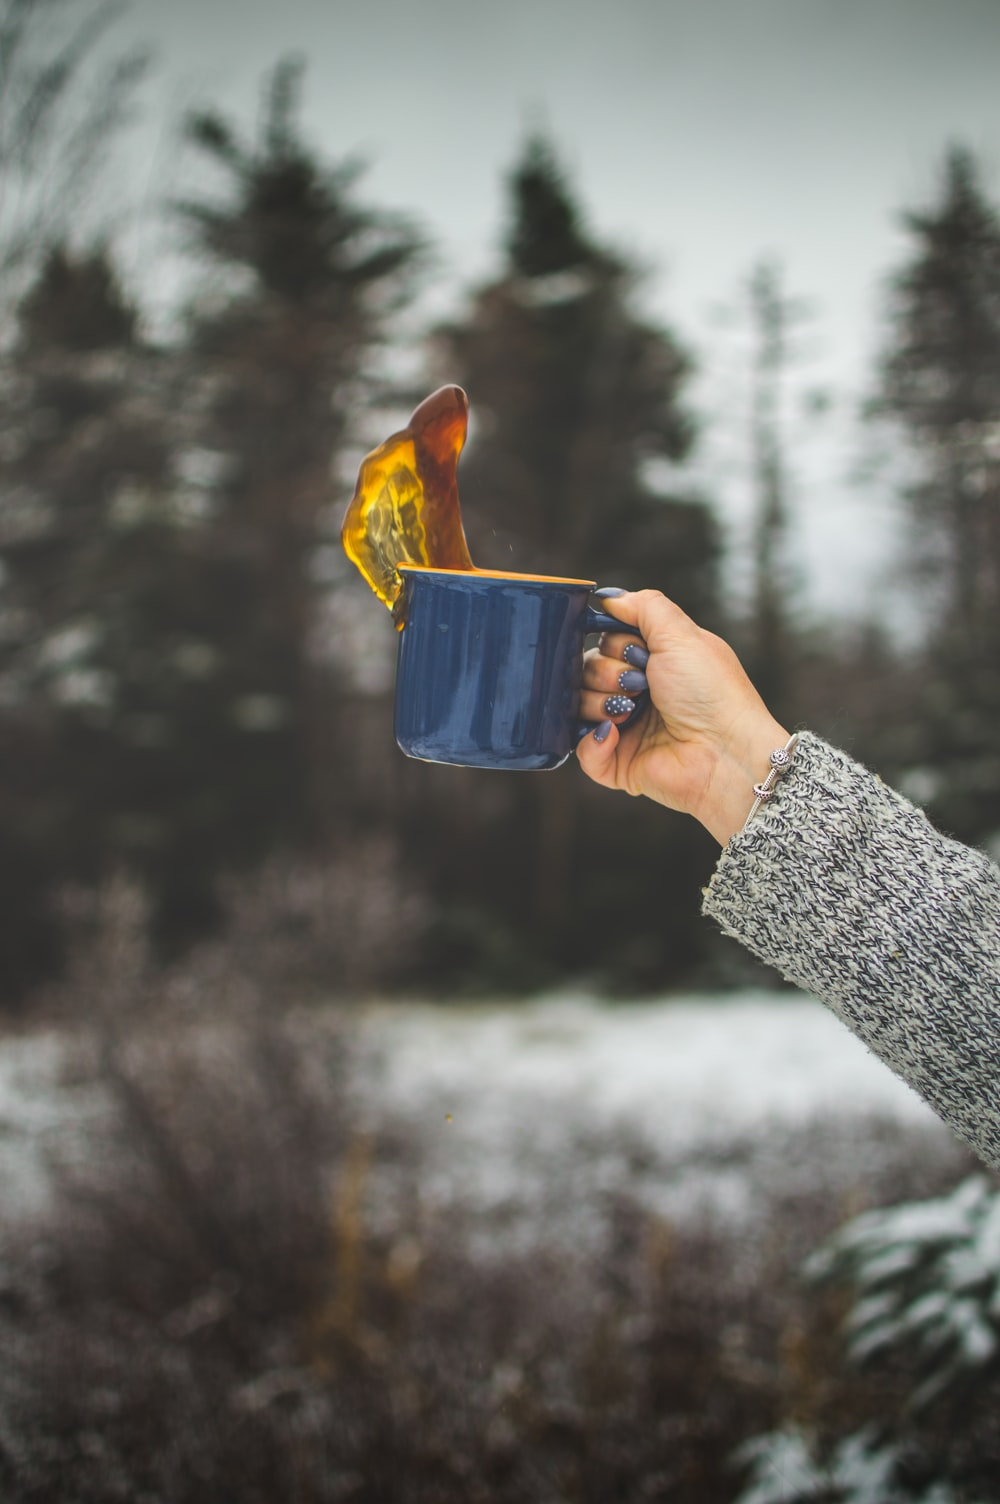 time lapse photo of woman holding blue ceramic mug with coffee spilled upward